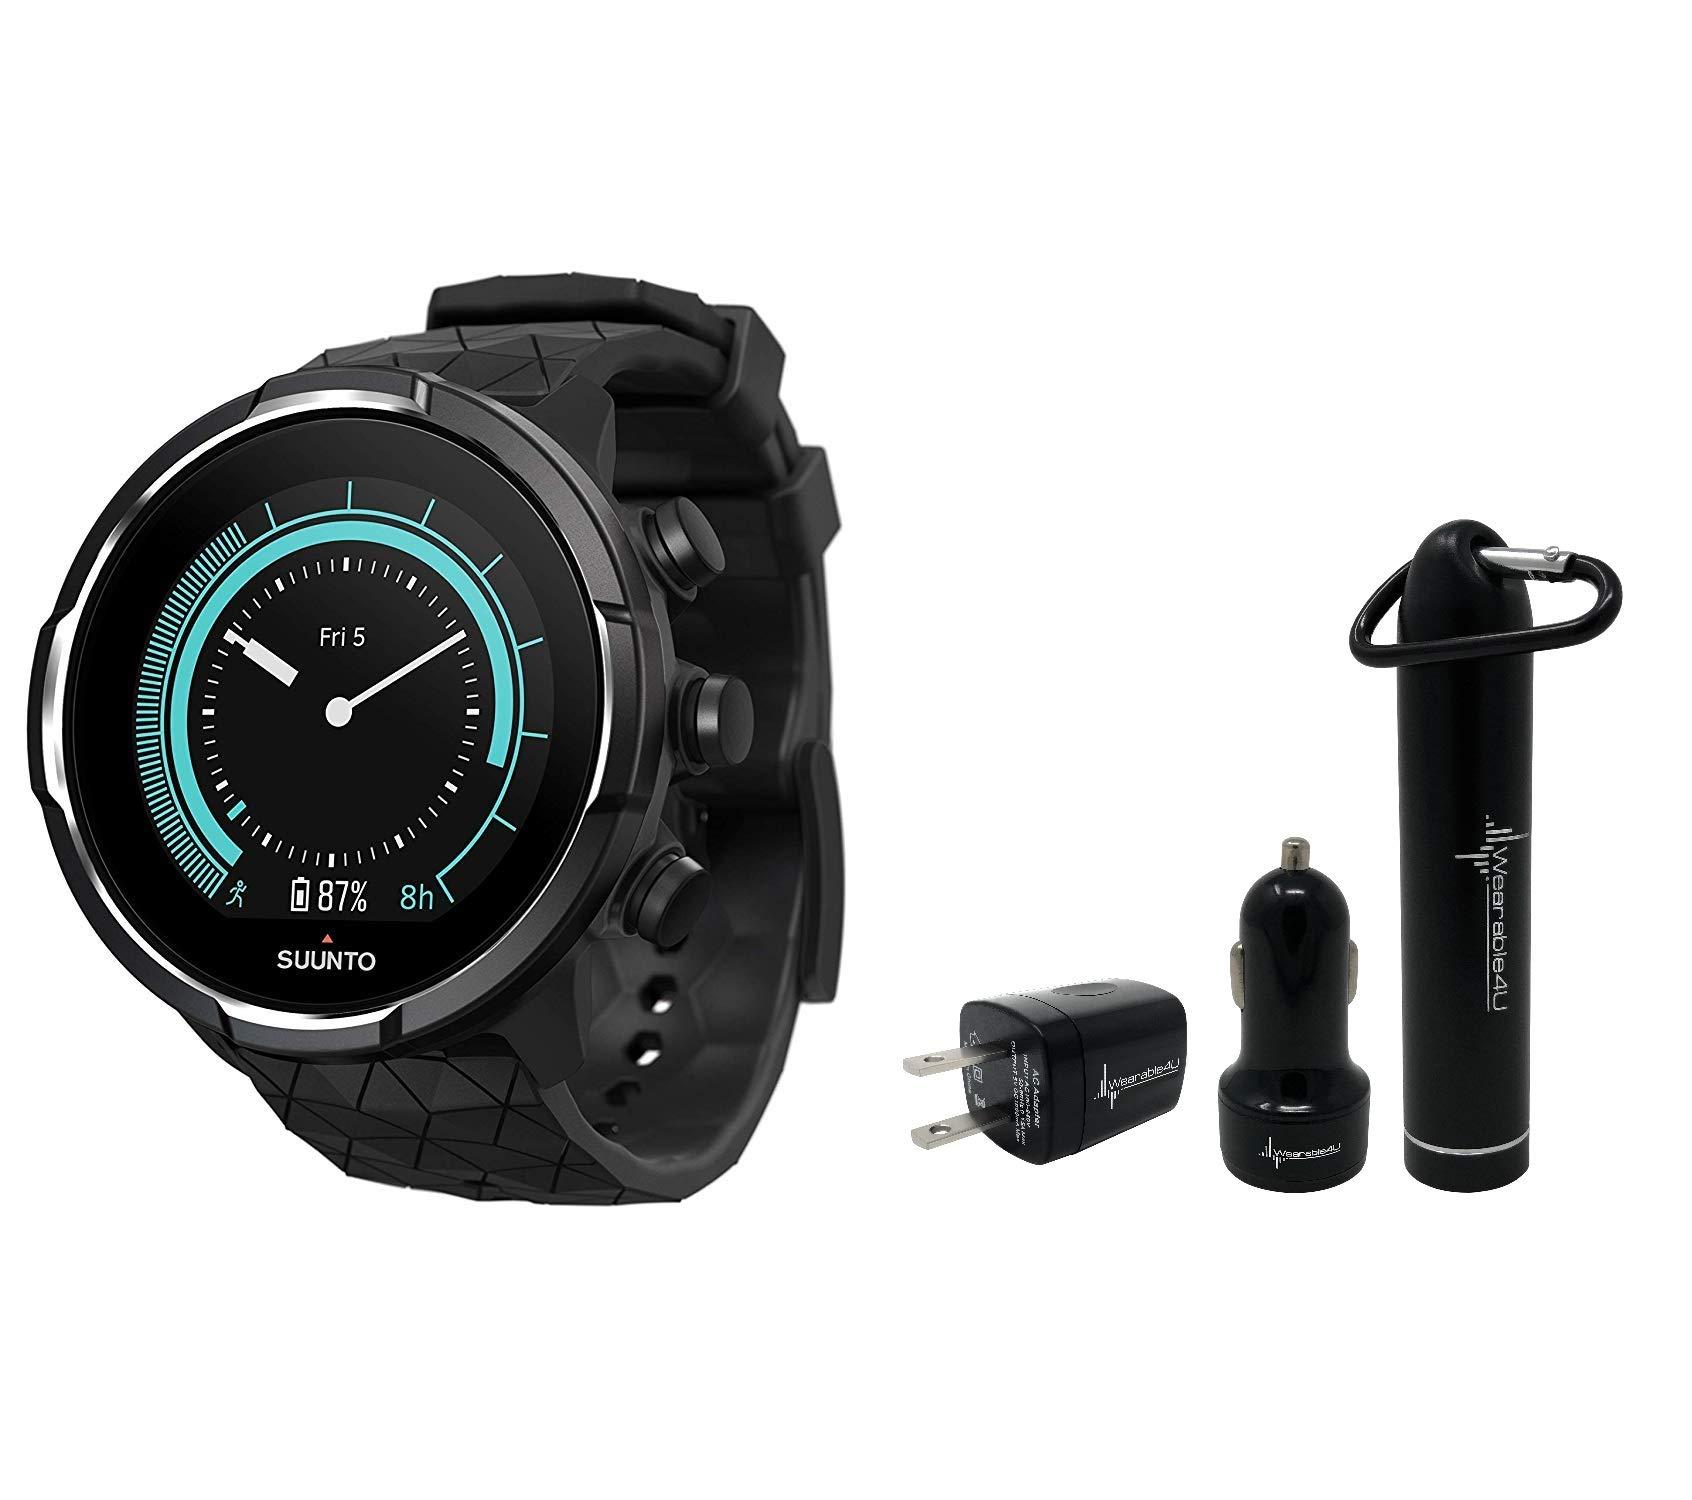 Suunto 9 Baro Durable Multisport GPS Watch with Barometric Altitude and Wearable4U Power Pack Bundle (Black)